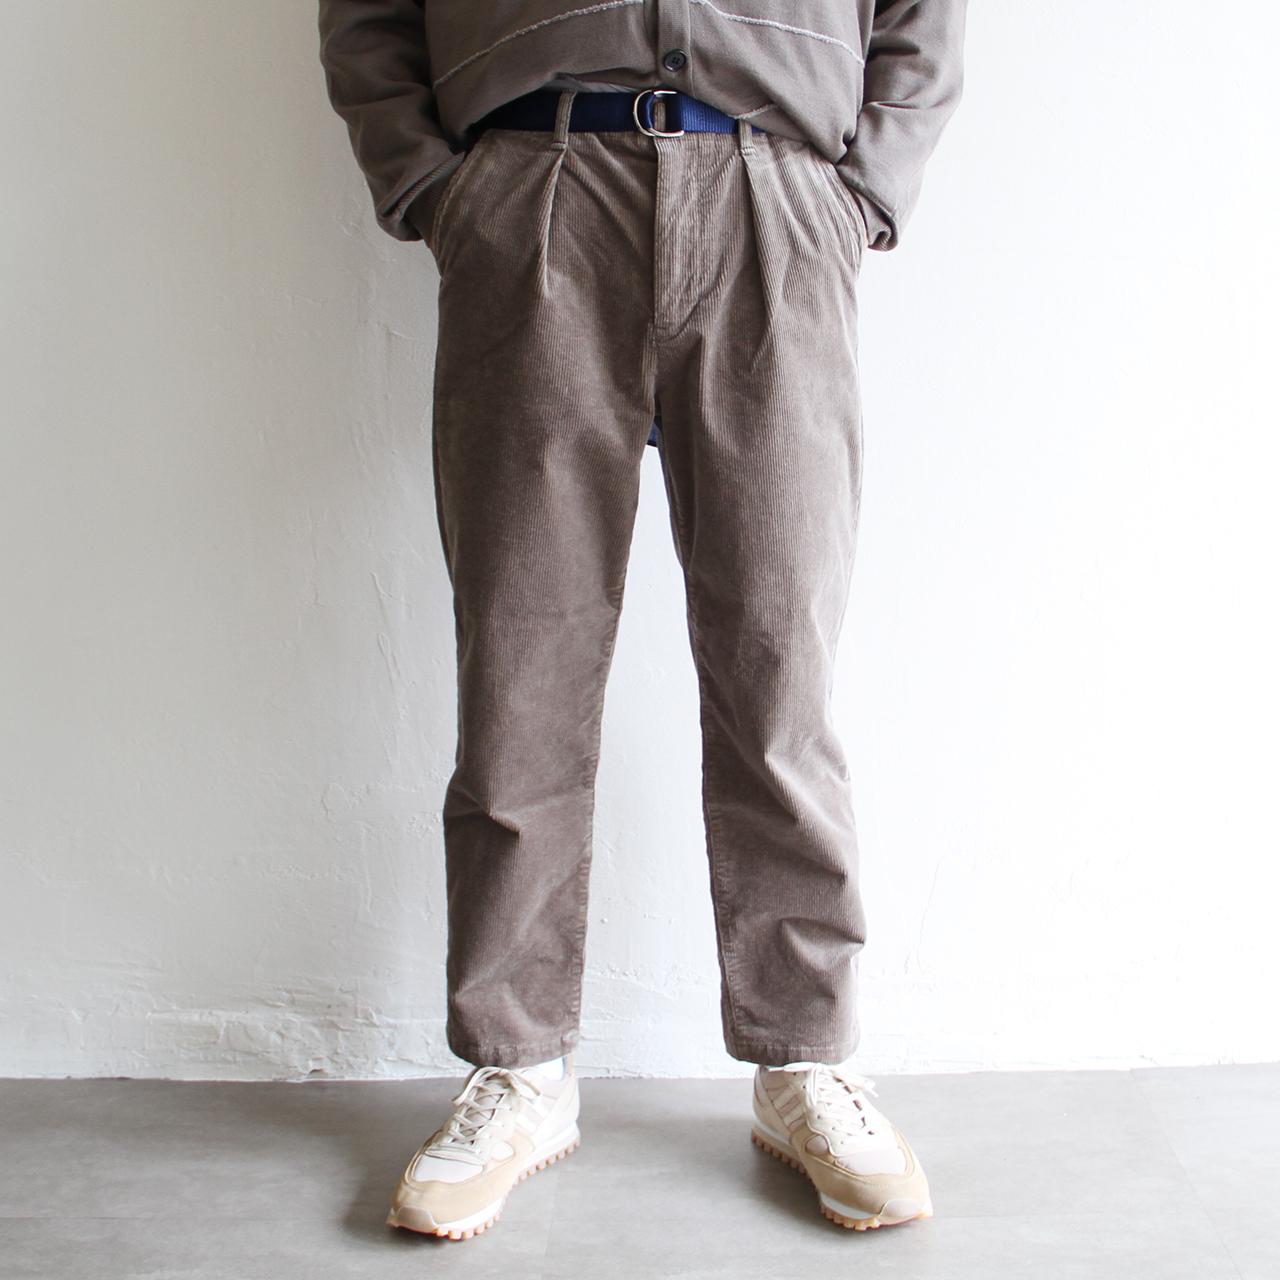 STILL BY HAND【 mens 】corduroy pants